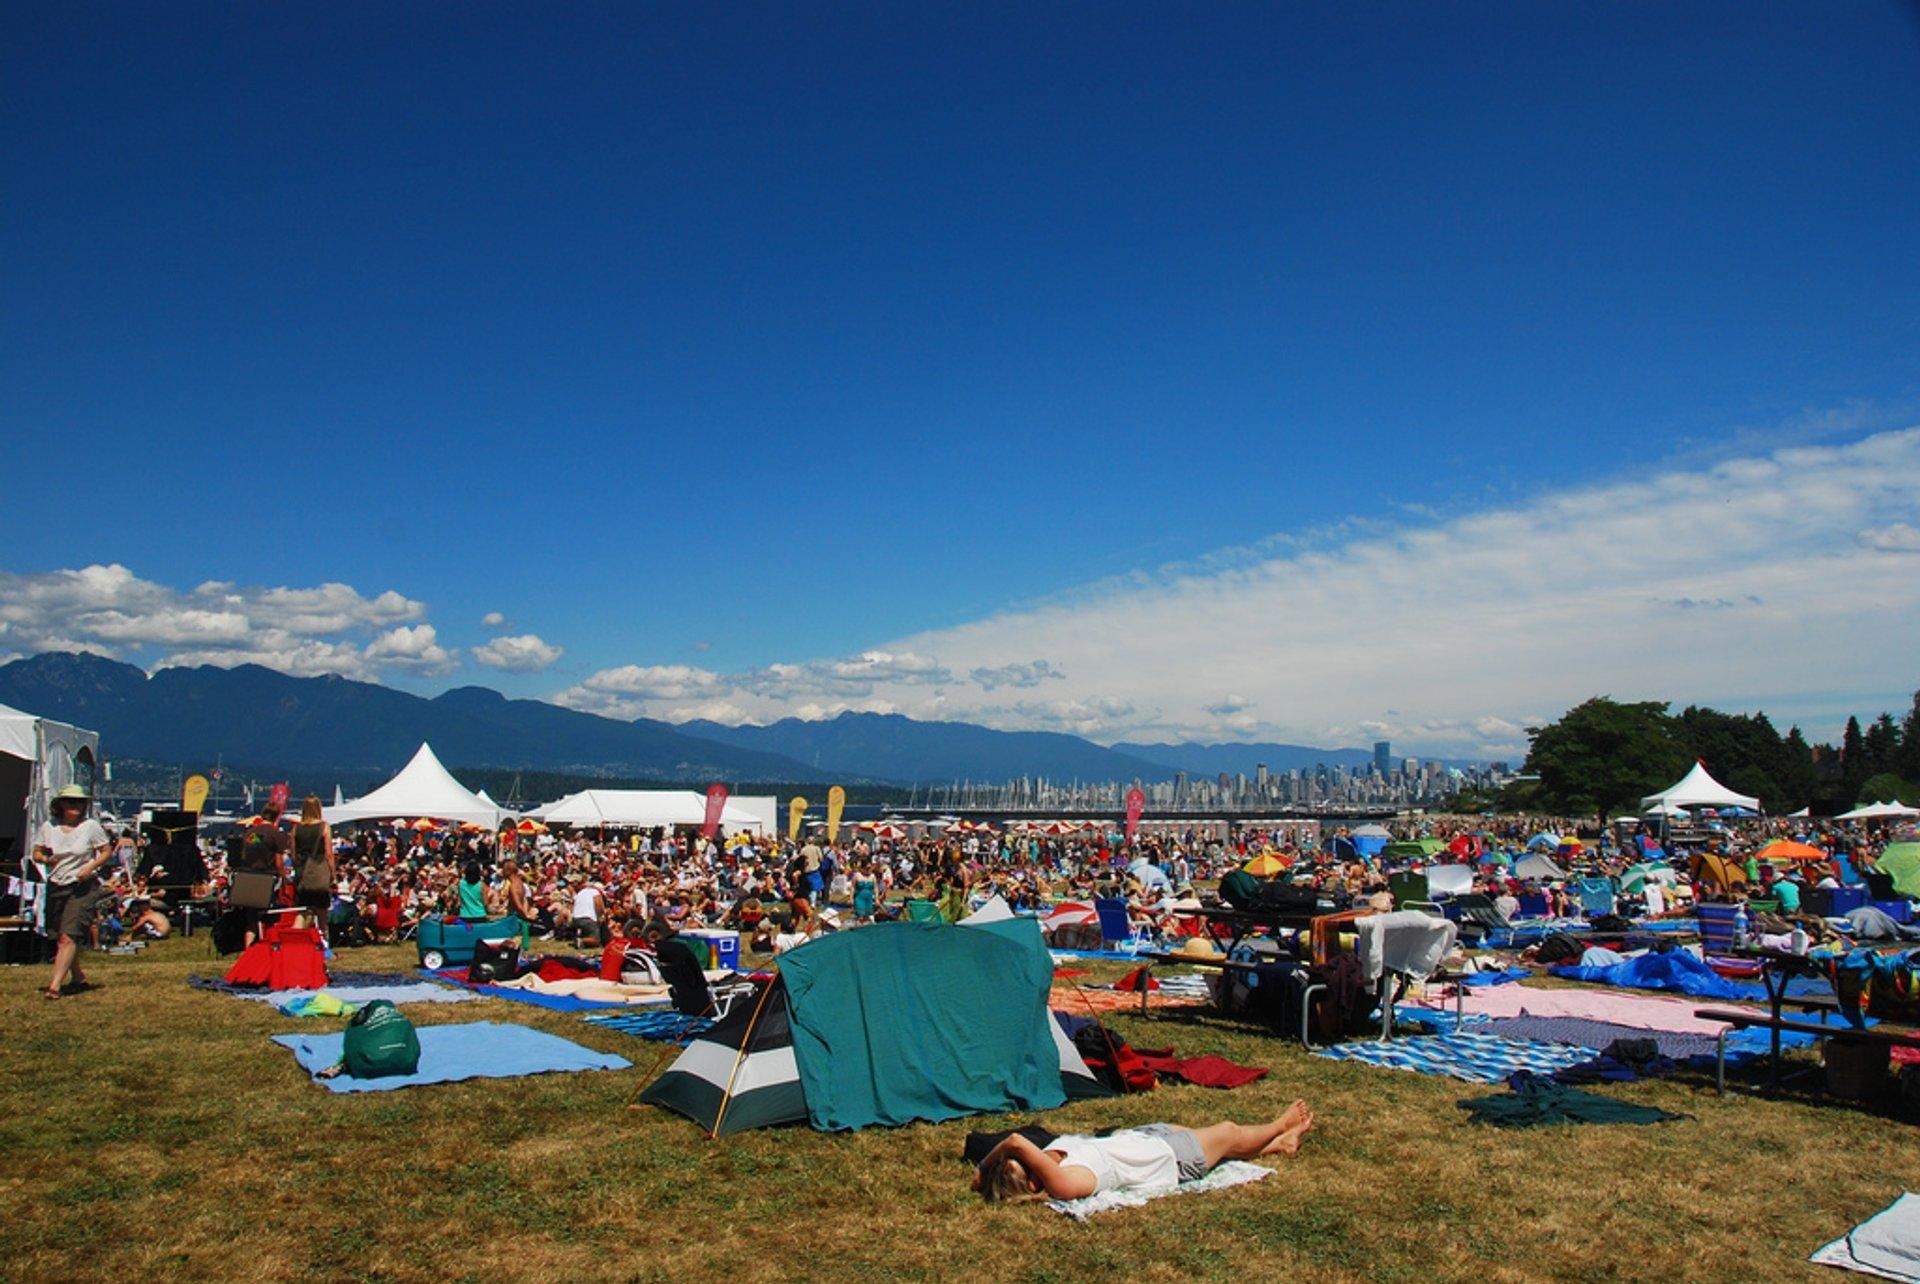 Vancouver Folk Music Festival in Vancouver - Best Season 2020